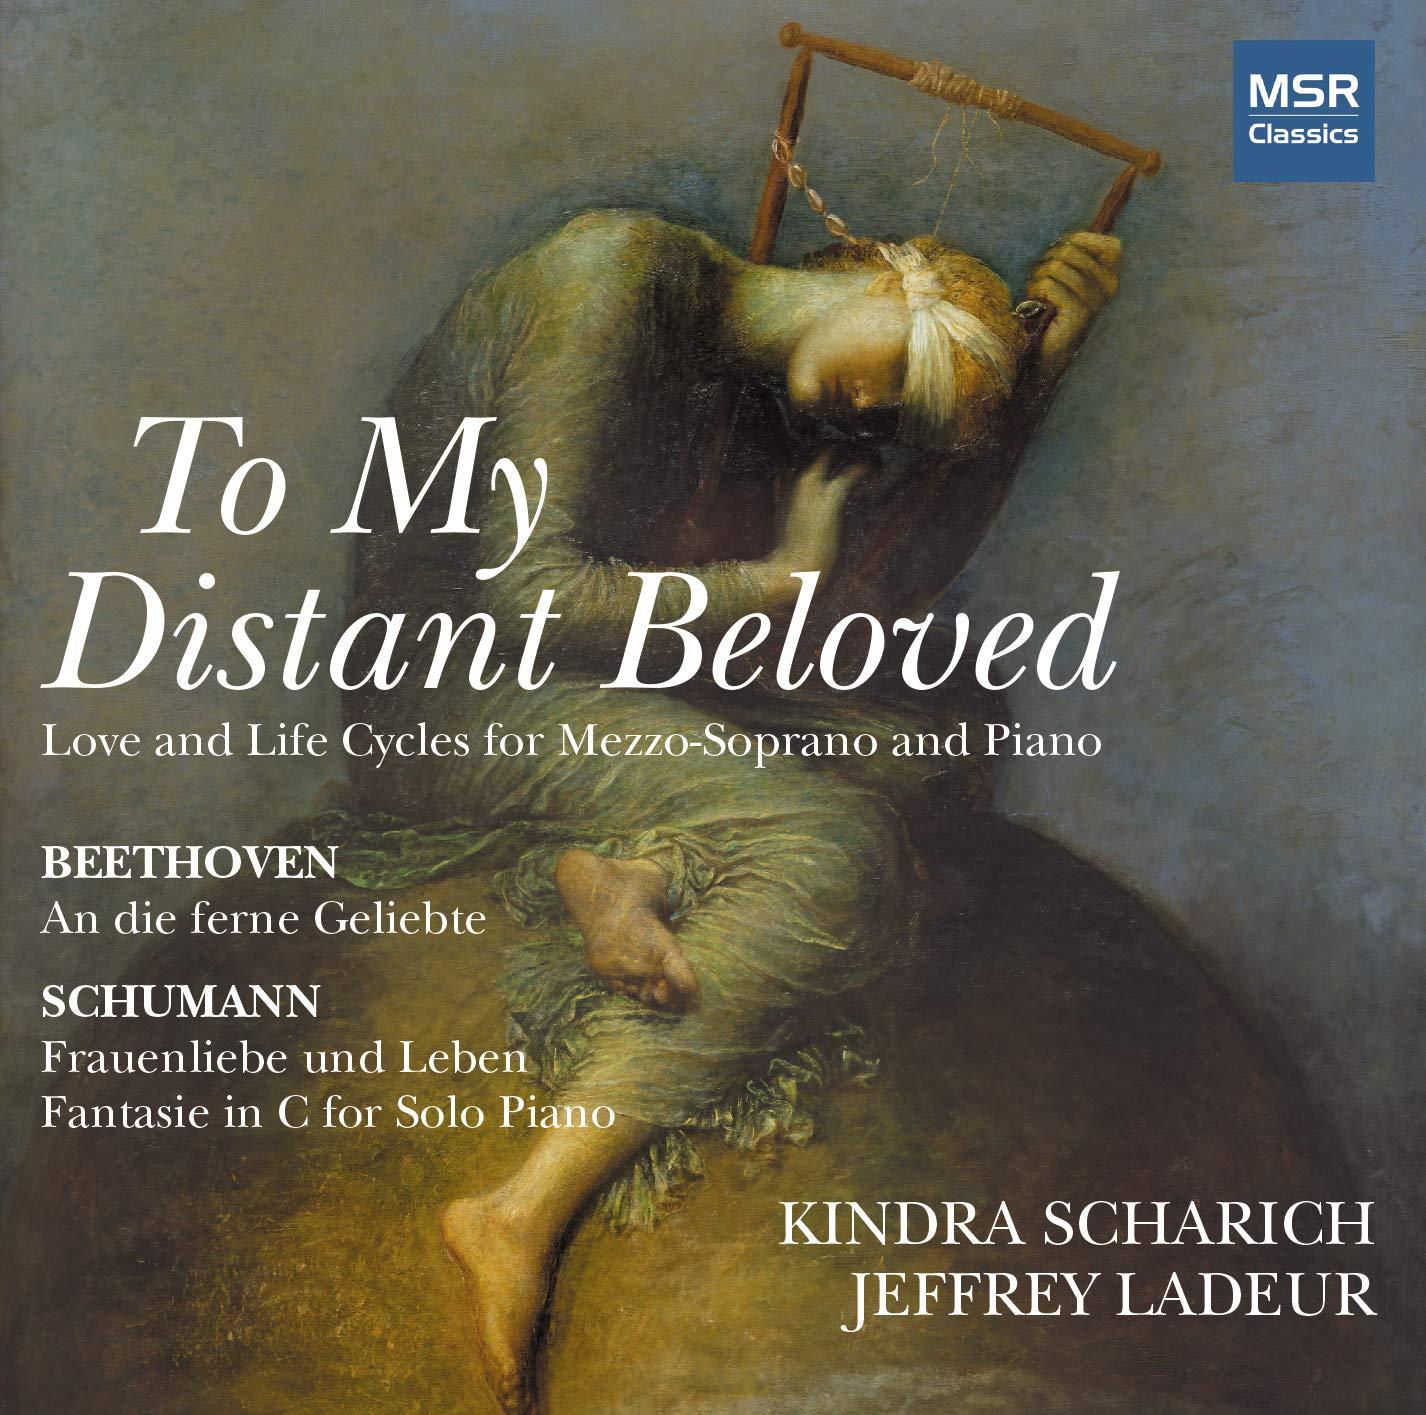 IN REVIEW: Ludwig van Beethoven & Robert Schumann - TO MY DISTANT BELOVED (MSR Classics MS 1762)